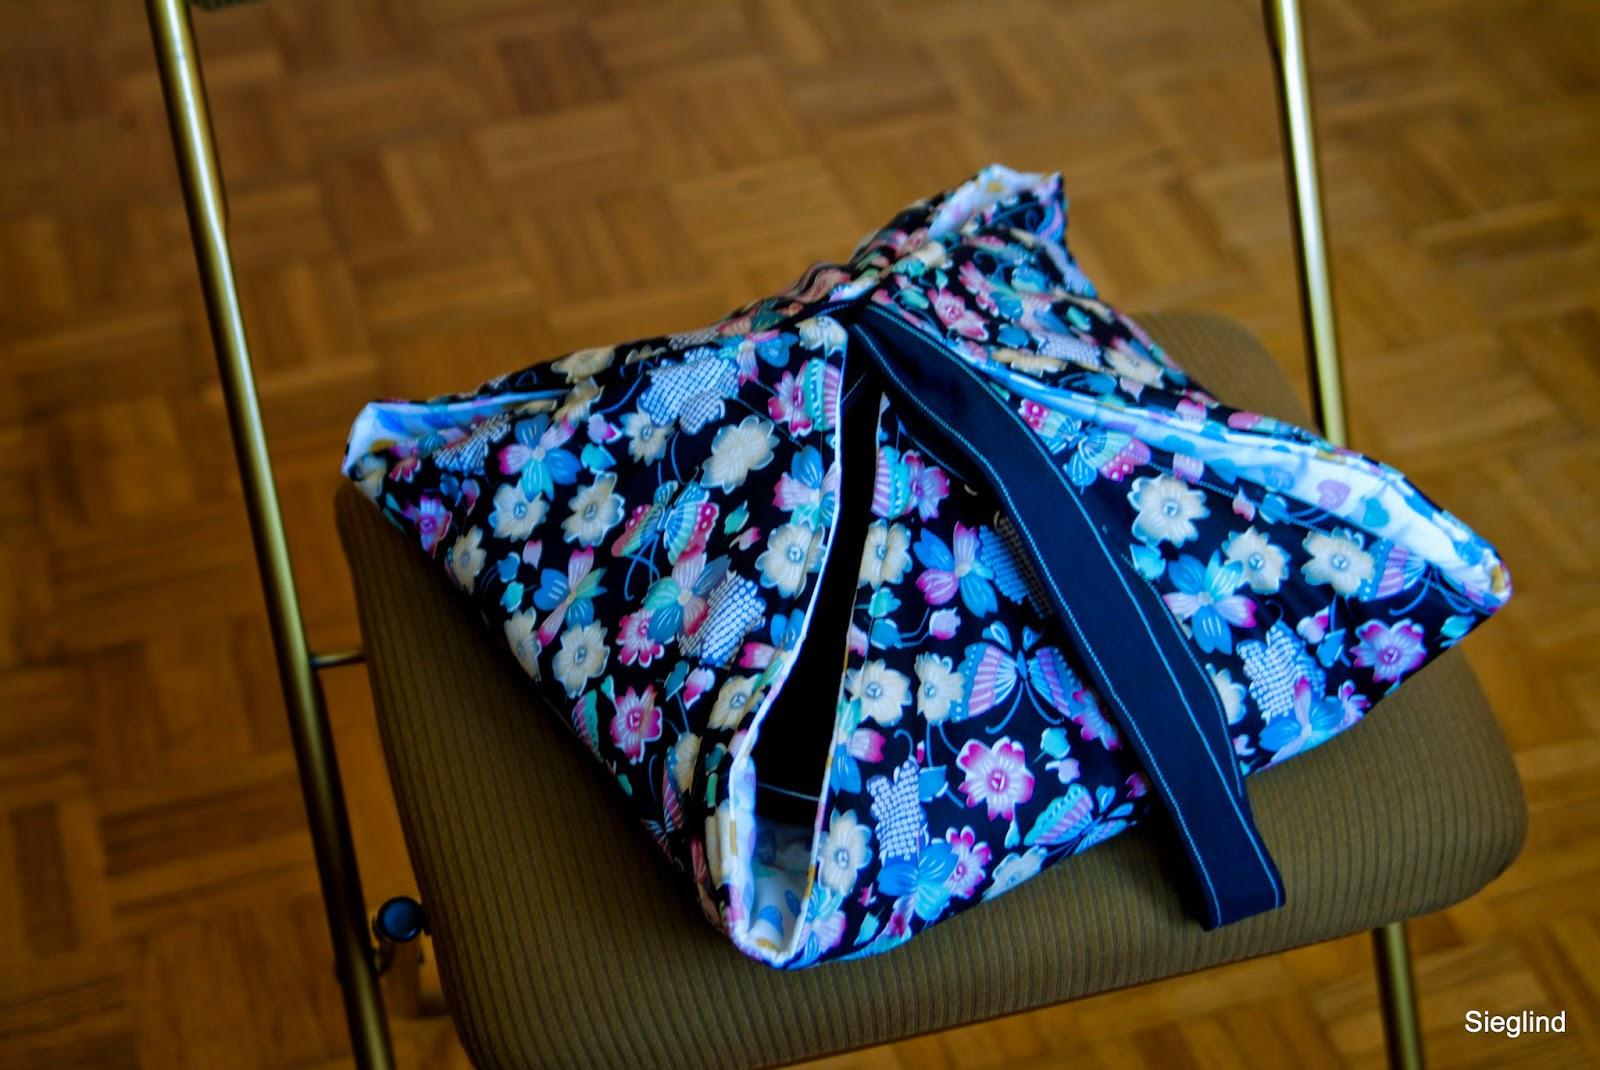 du fil dans les id es sac porte tarte de m m. Black Bedroom Furniture Sets. Home Design Ideas